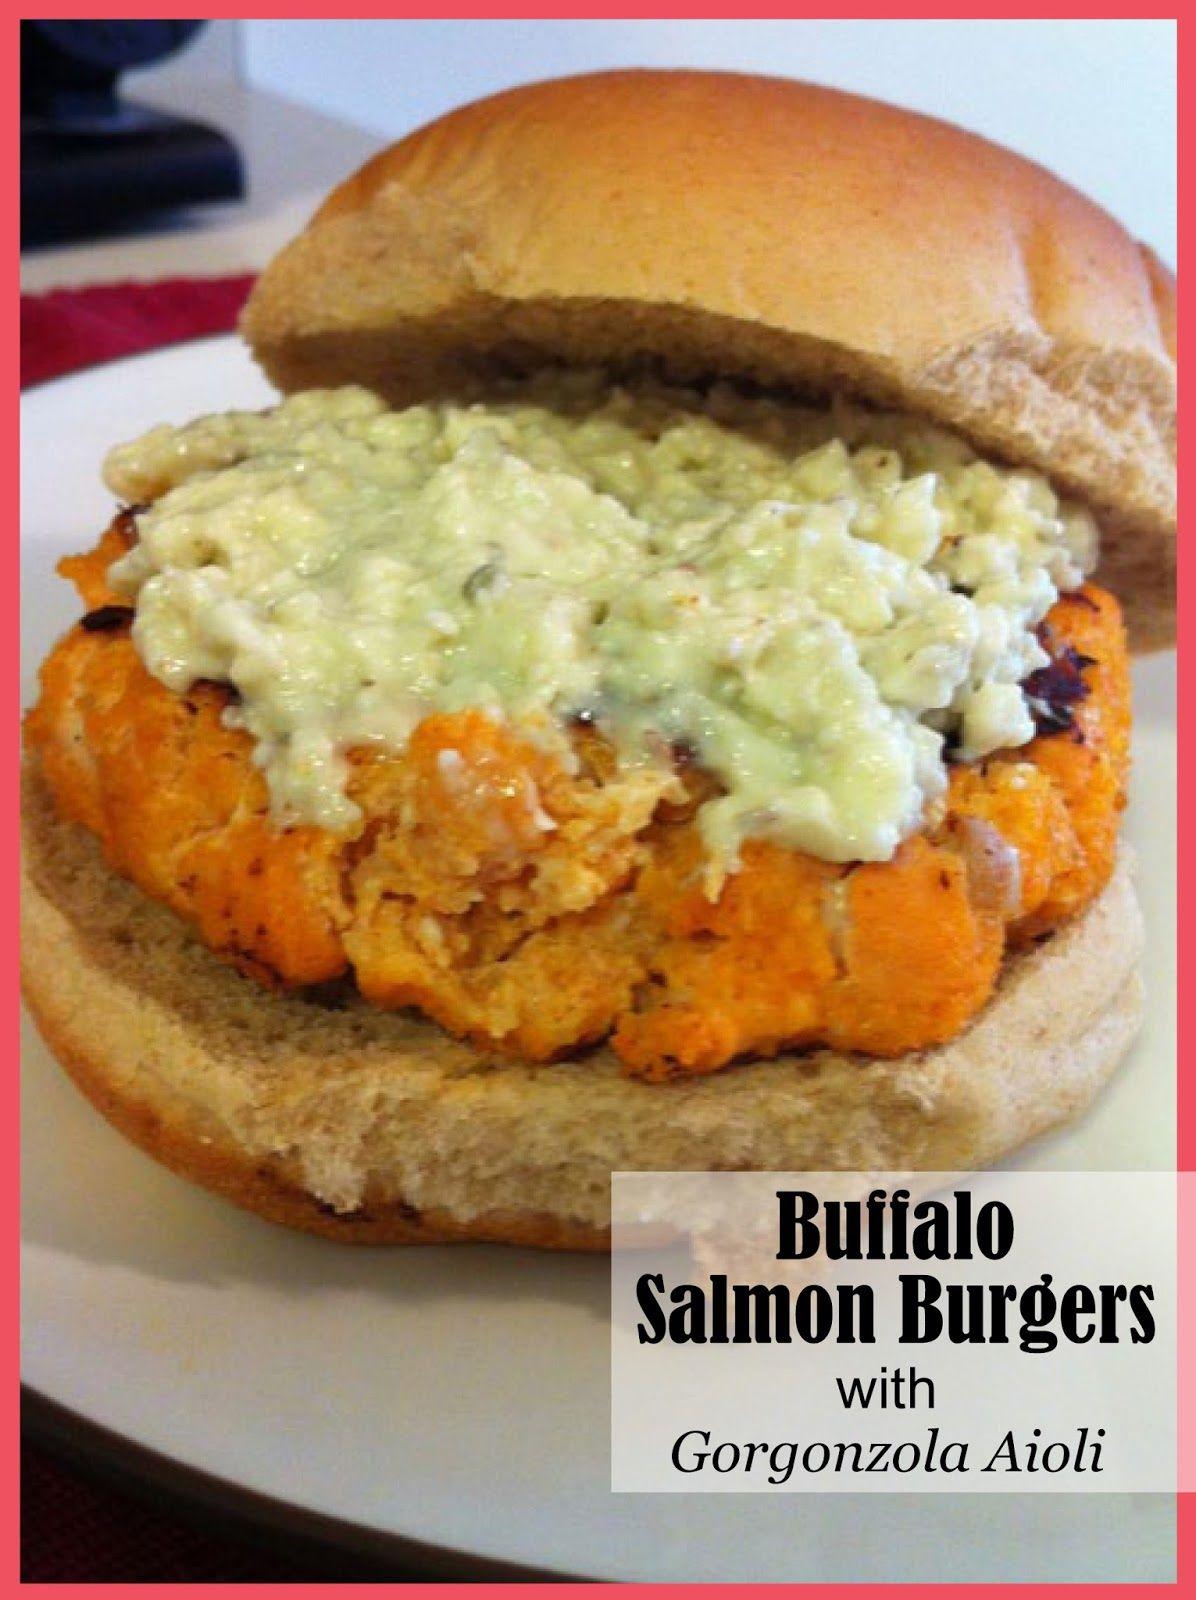 Buffalo Salmon Burgers with Gorgonzola Aioli ~ Life a la Wine | A Lifestyle, Food & Running Blog Skip the bun and the panko.